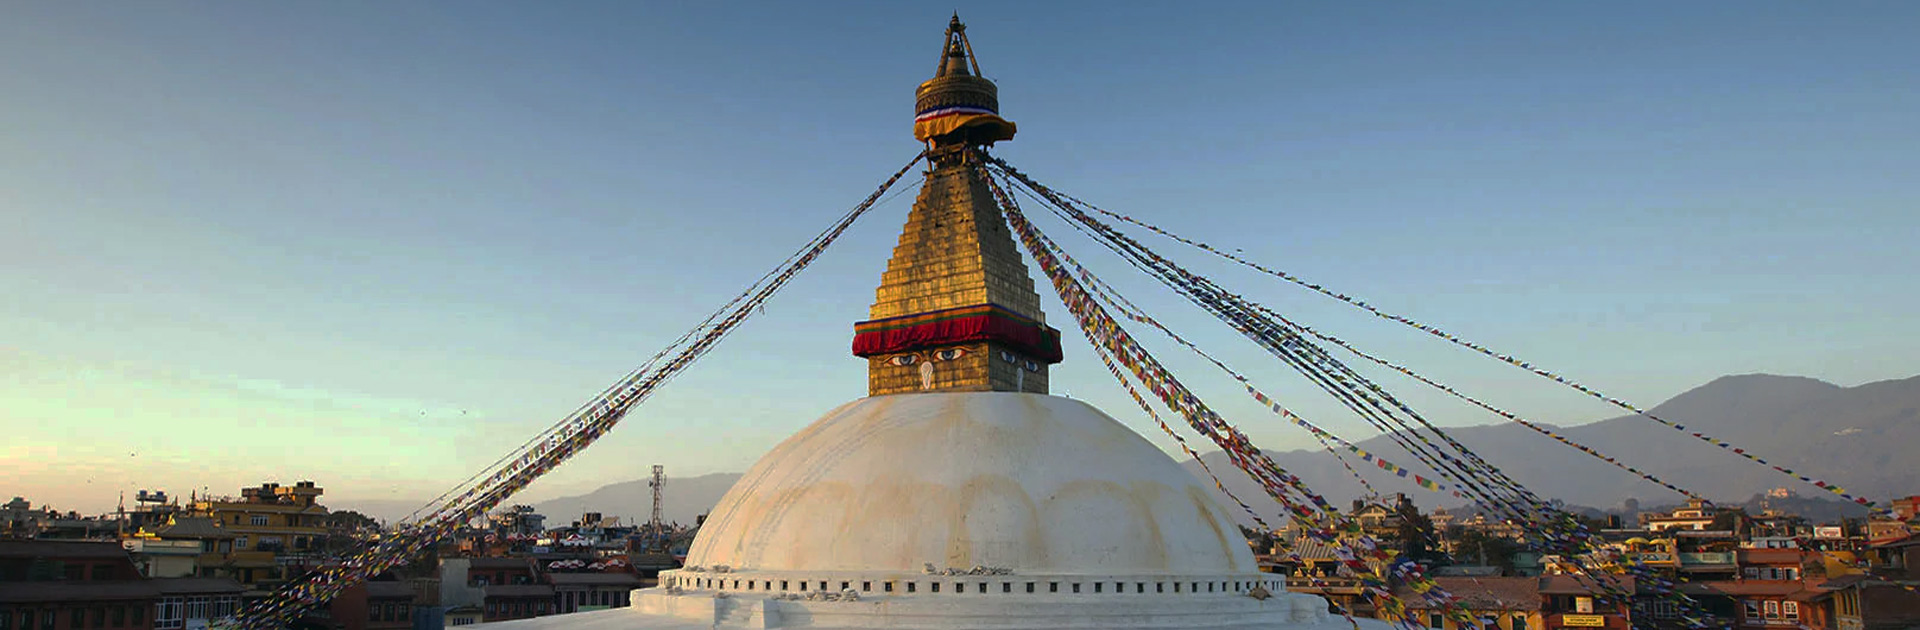 NP Nepal Grandes Paisajes y Trekking 12 días 2